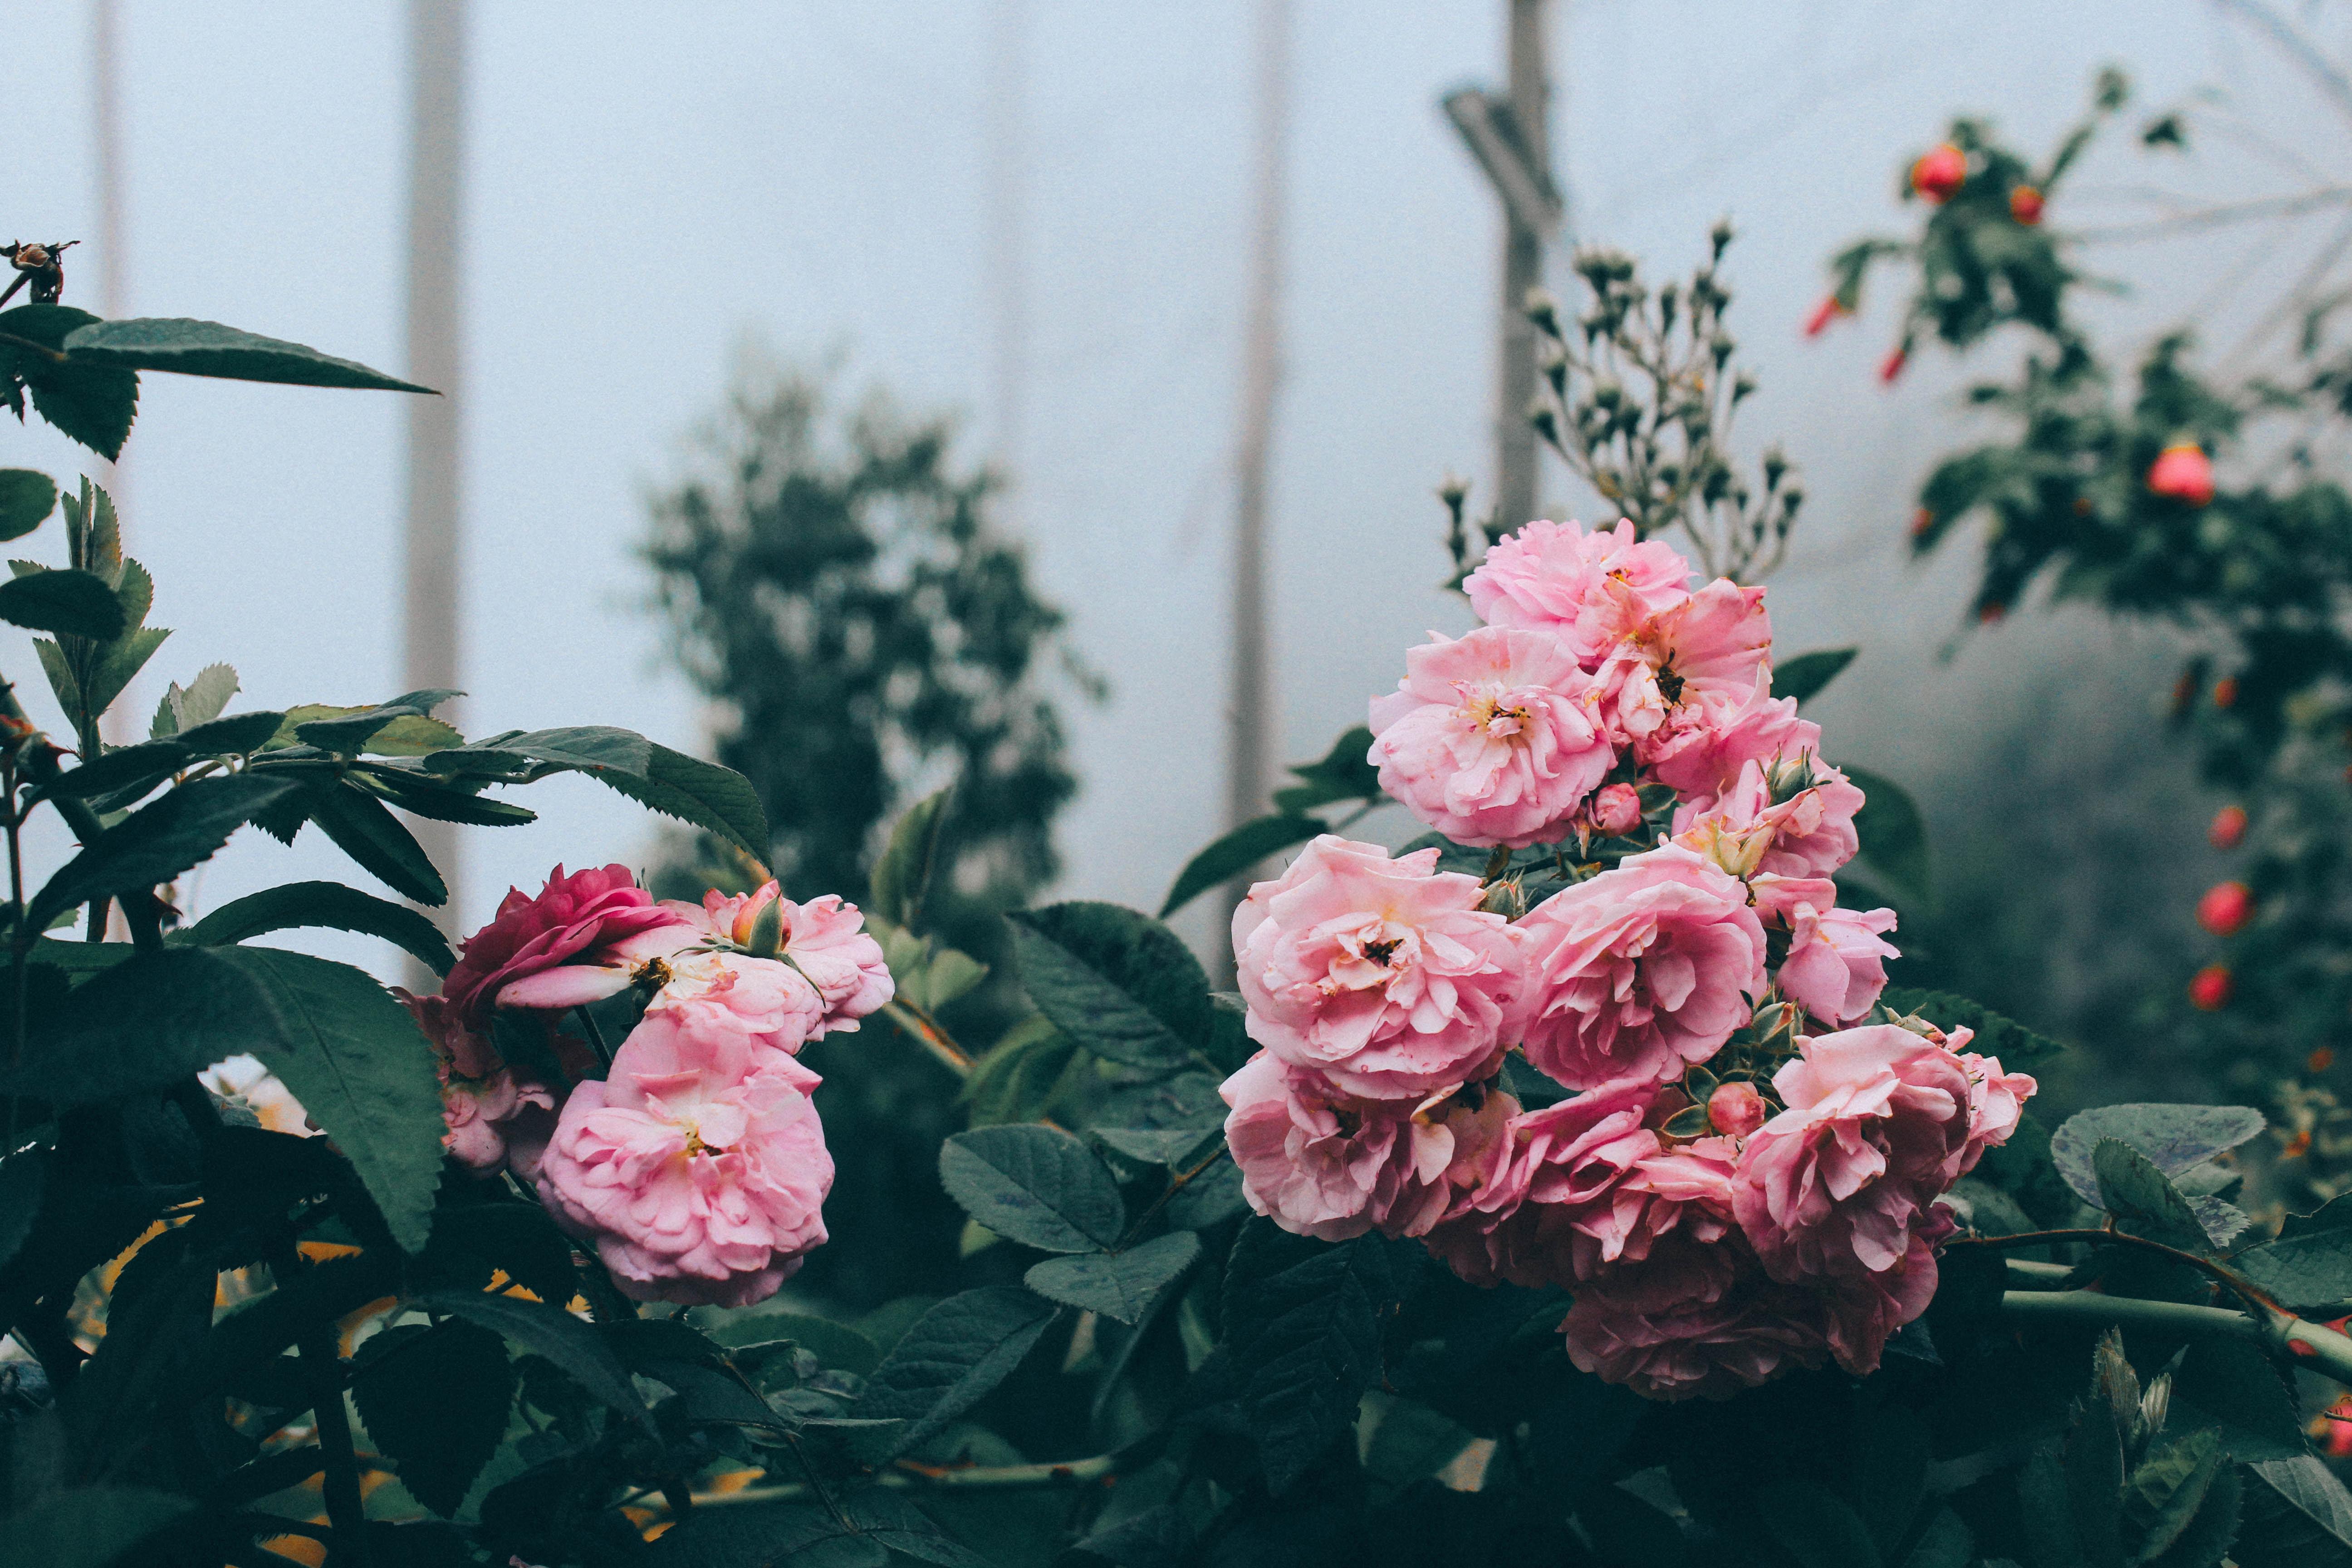 Pink peonies in a misty garden